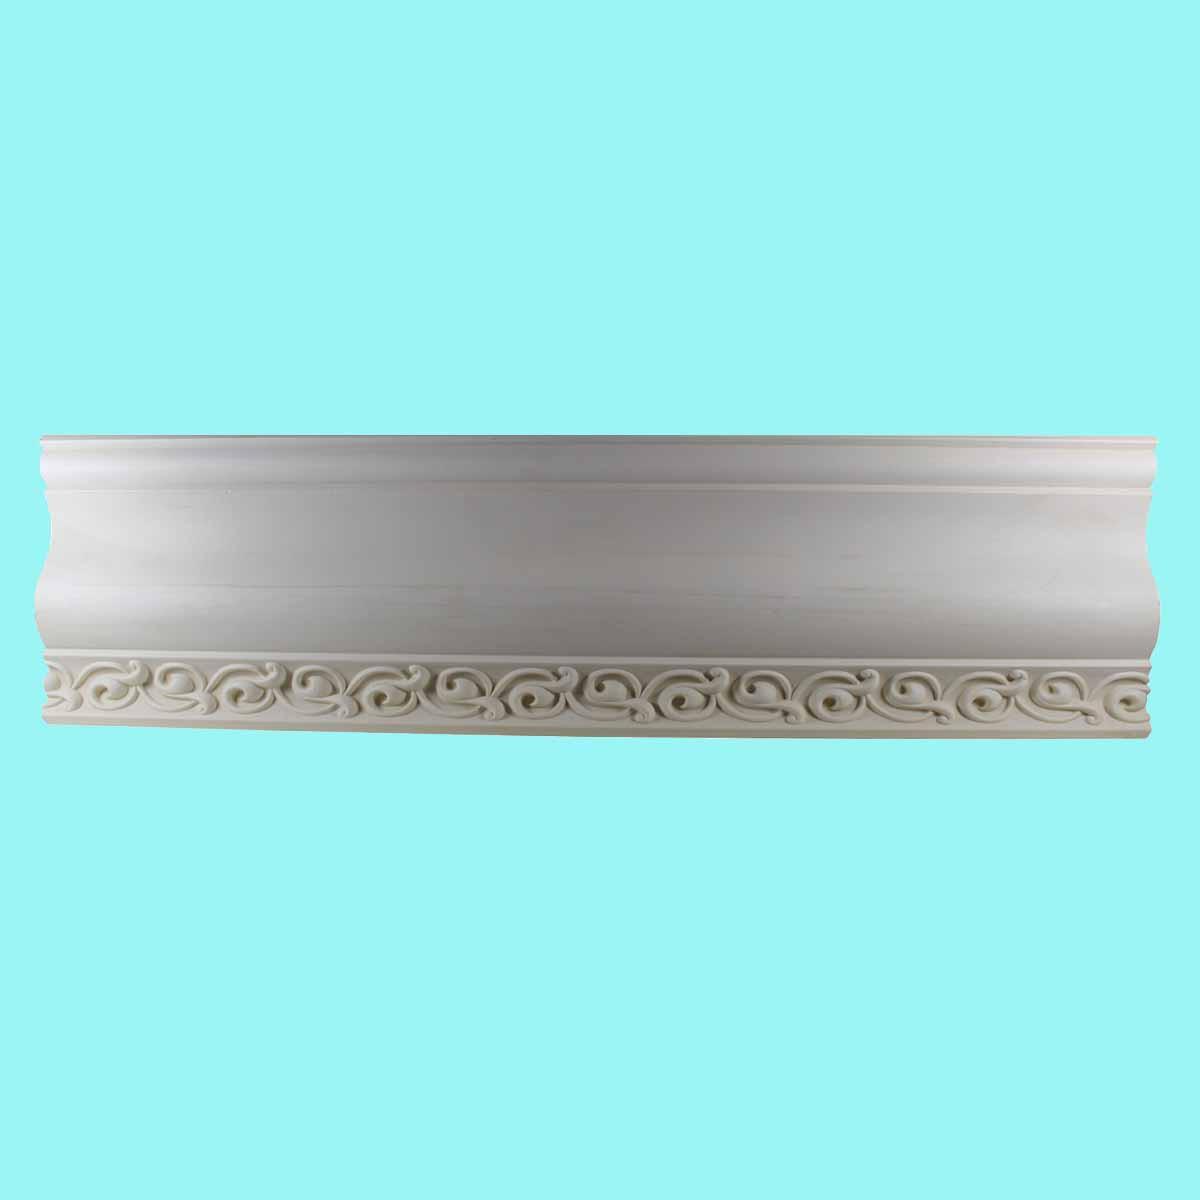 Cornice White Urethane Sample of 11179 23.5 Long Cornice Cornice Moulding Cornice Molding